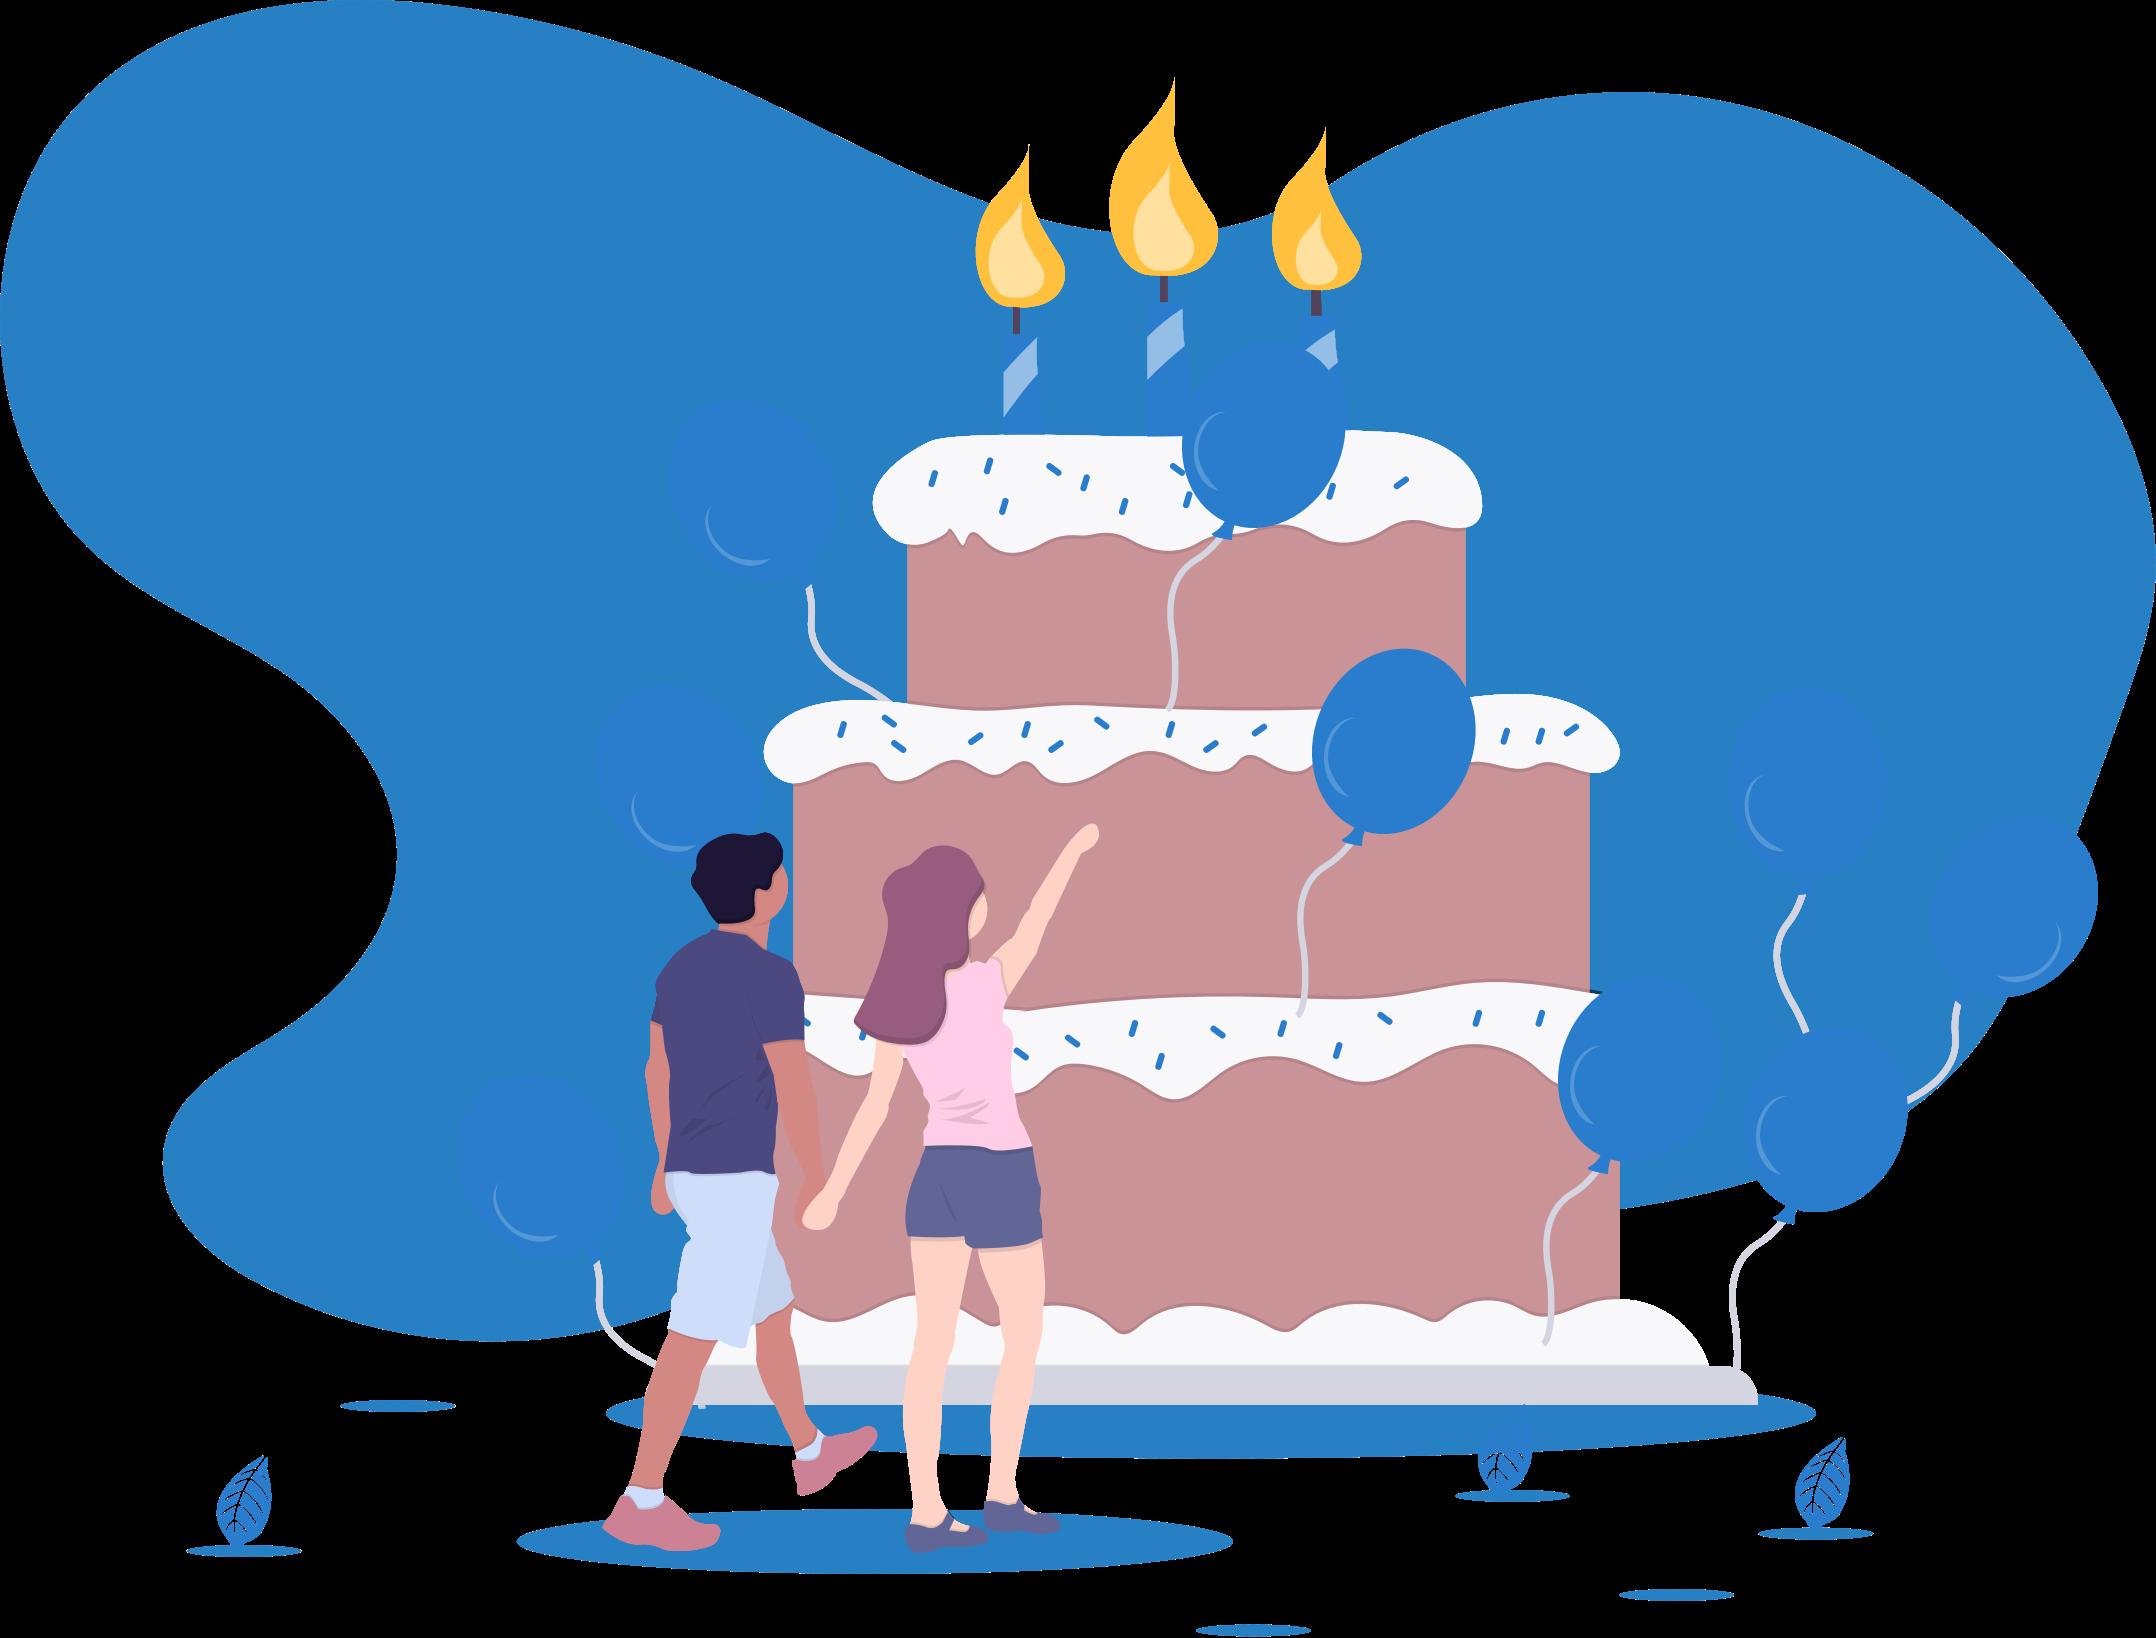 undraw_Birthday_cake_2wxy.png